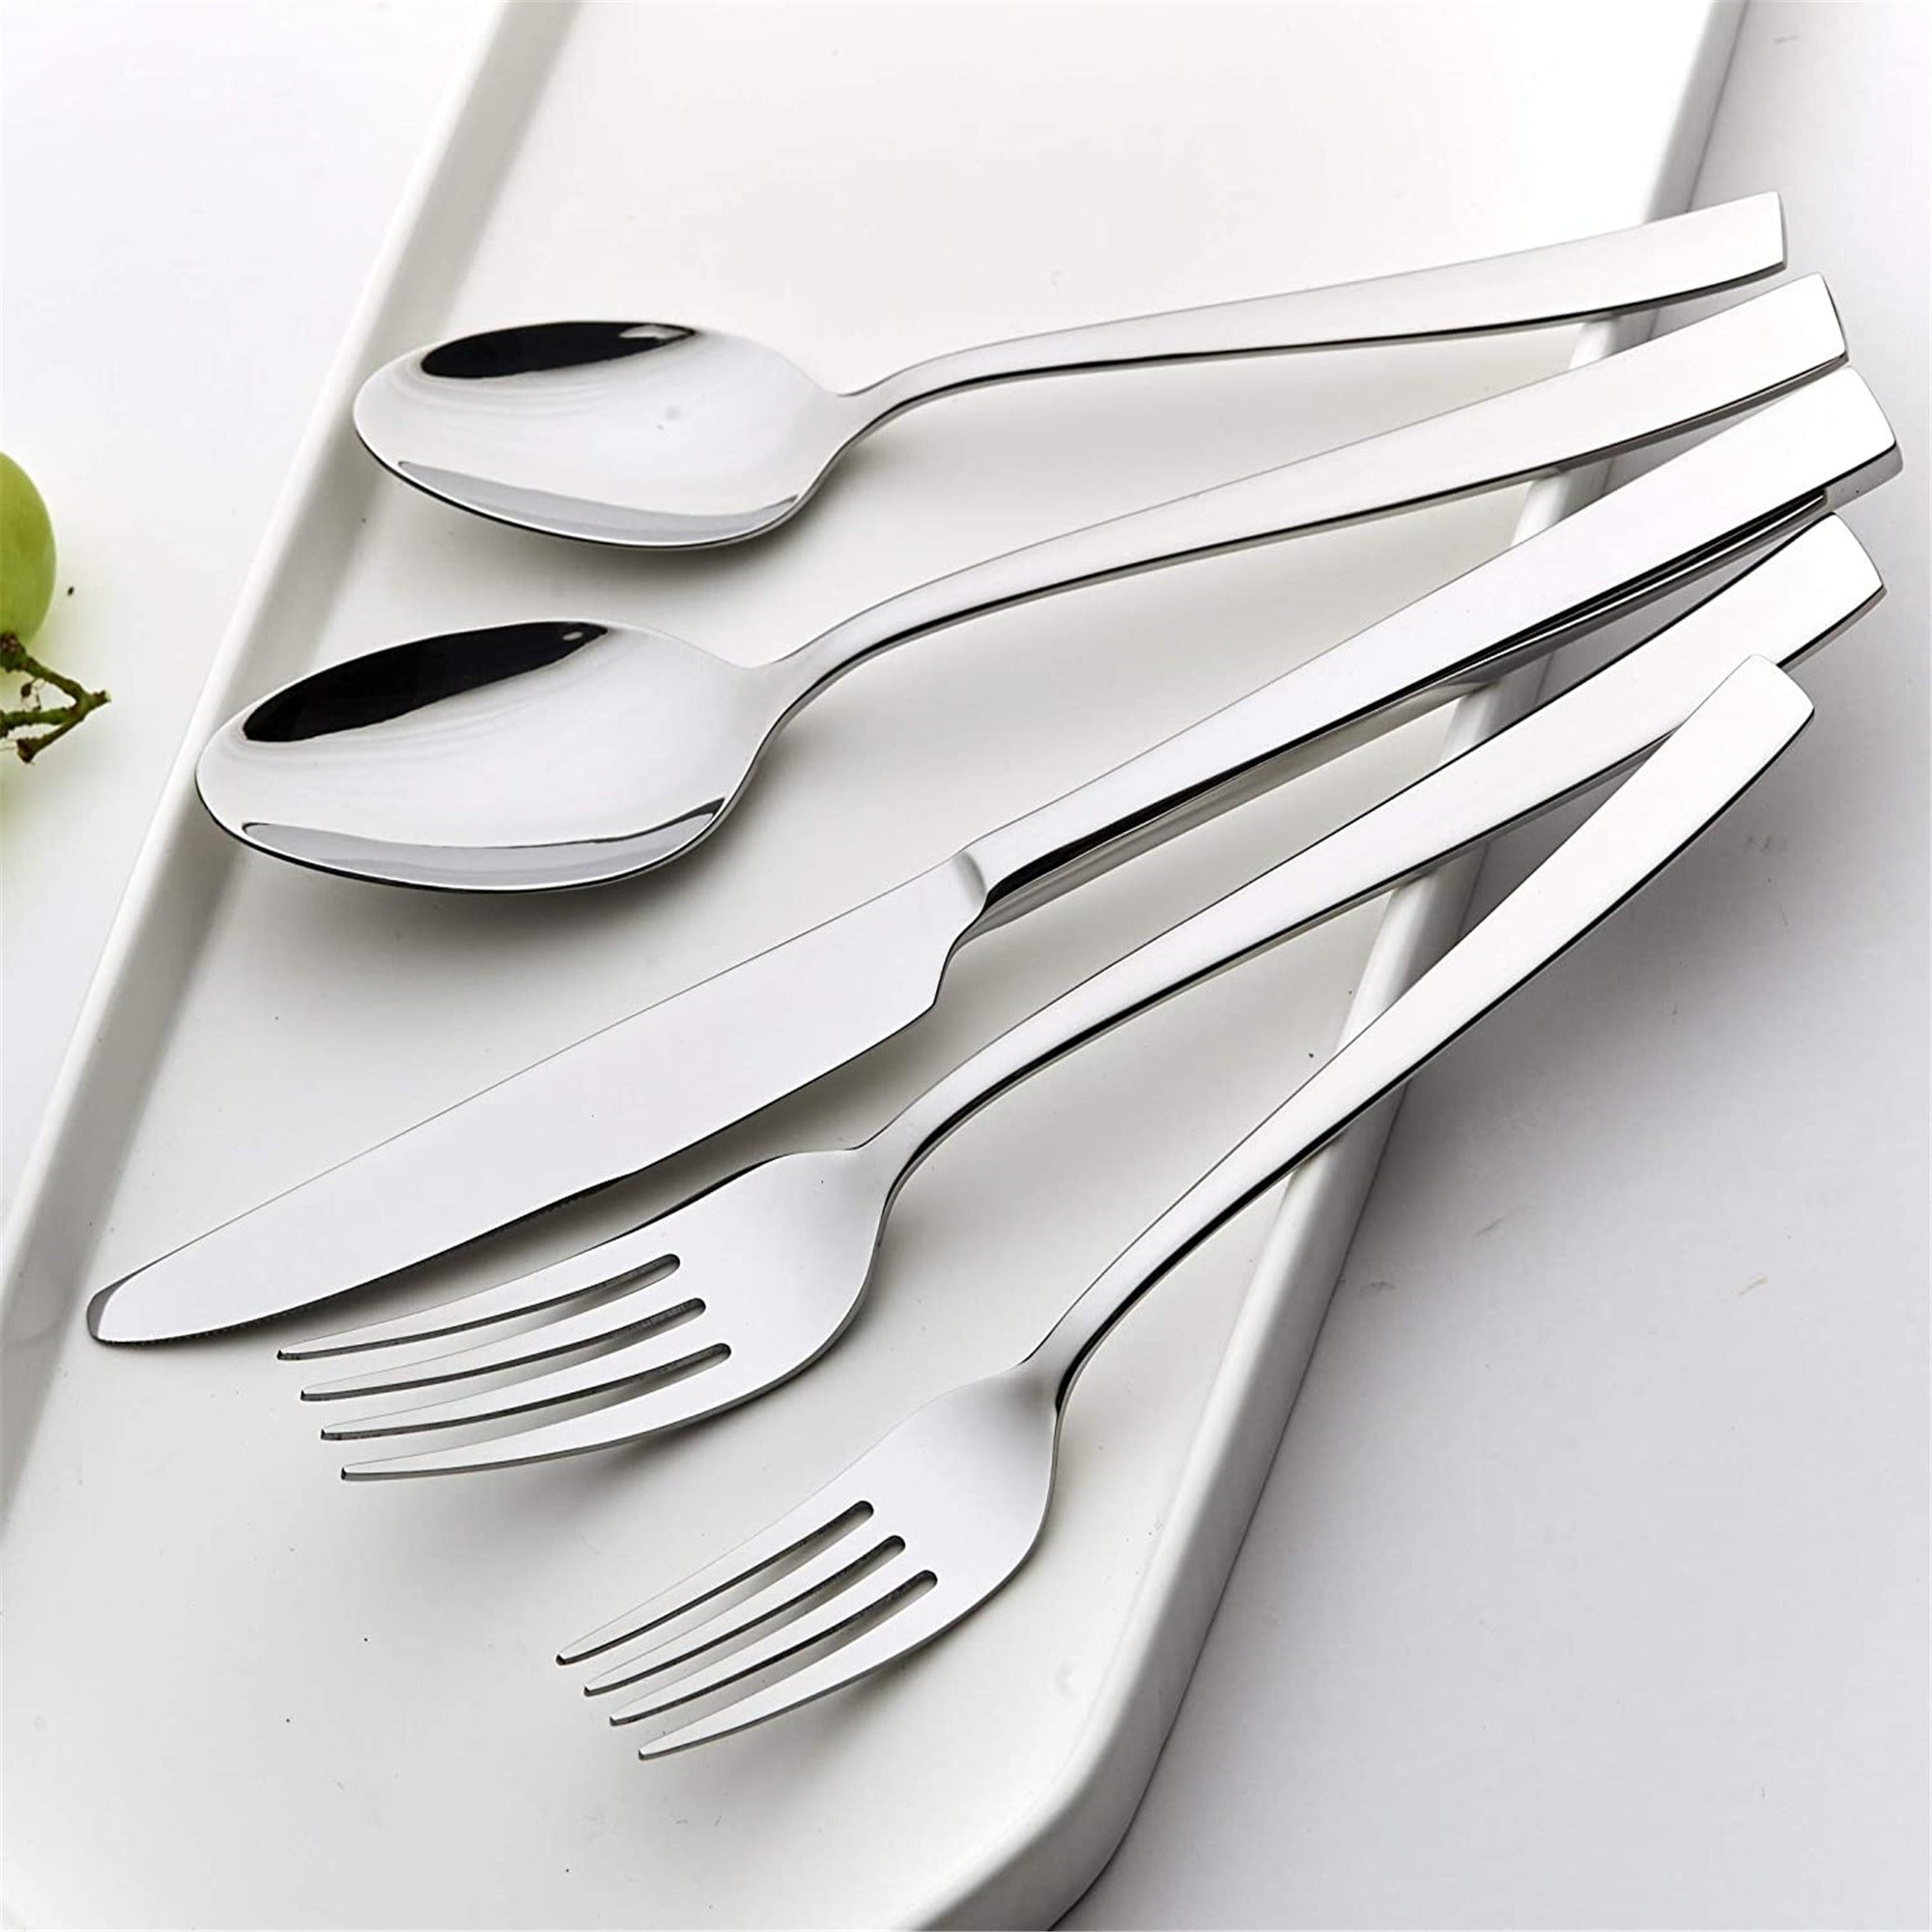 Details about  /Matte Black Silverware Set 20-Piece Stainless Steel Flatware Tableware Cutler...